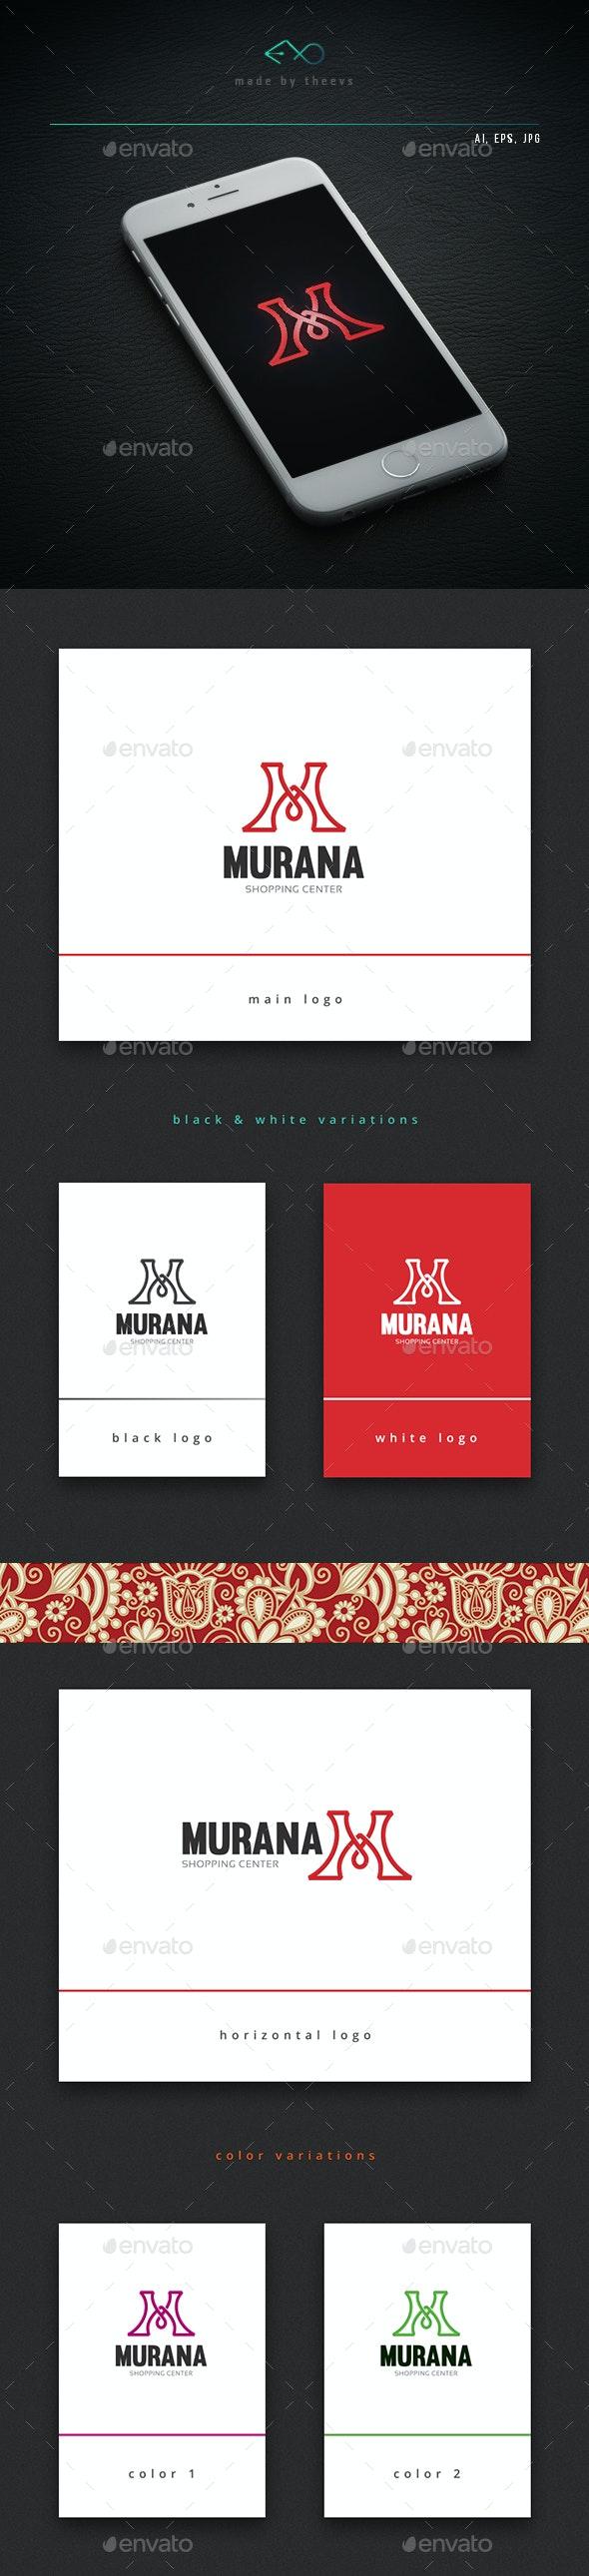 Murana - Letters Logo Templates